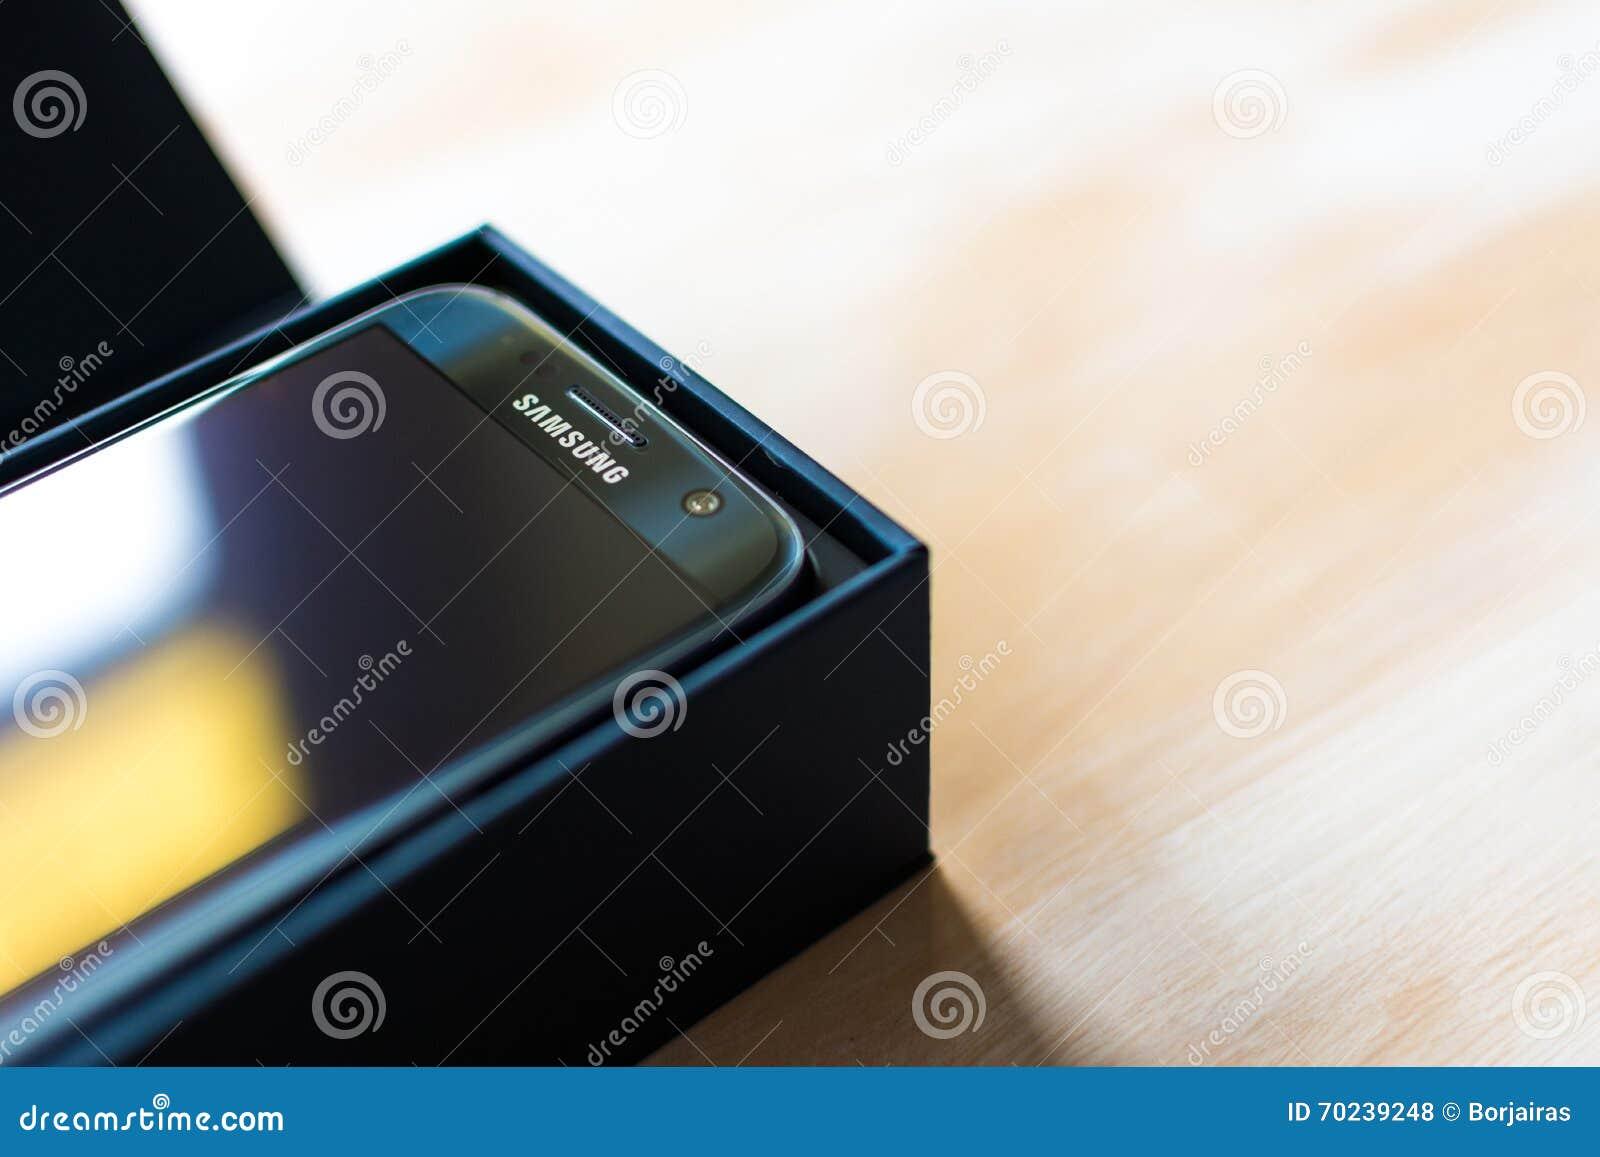 Samsung galax S7